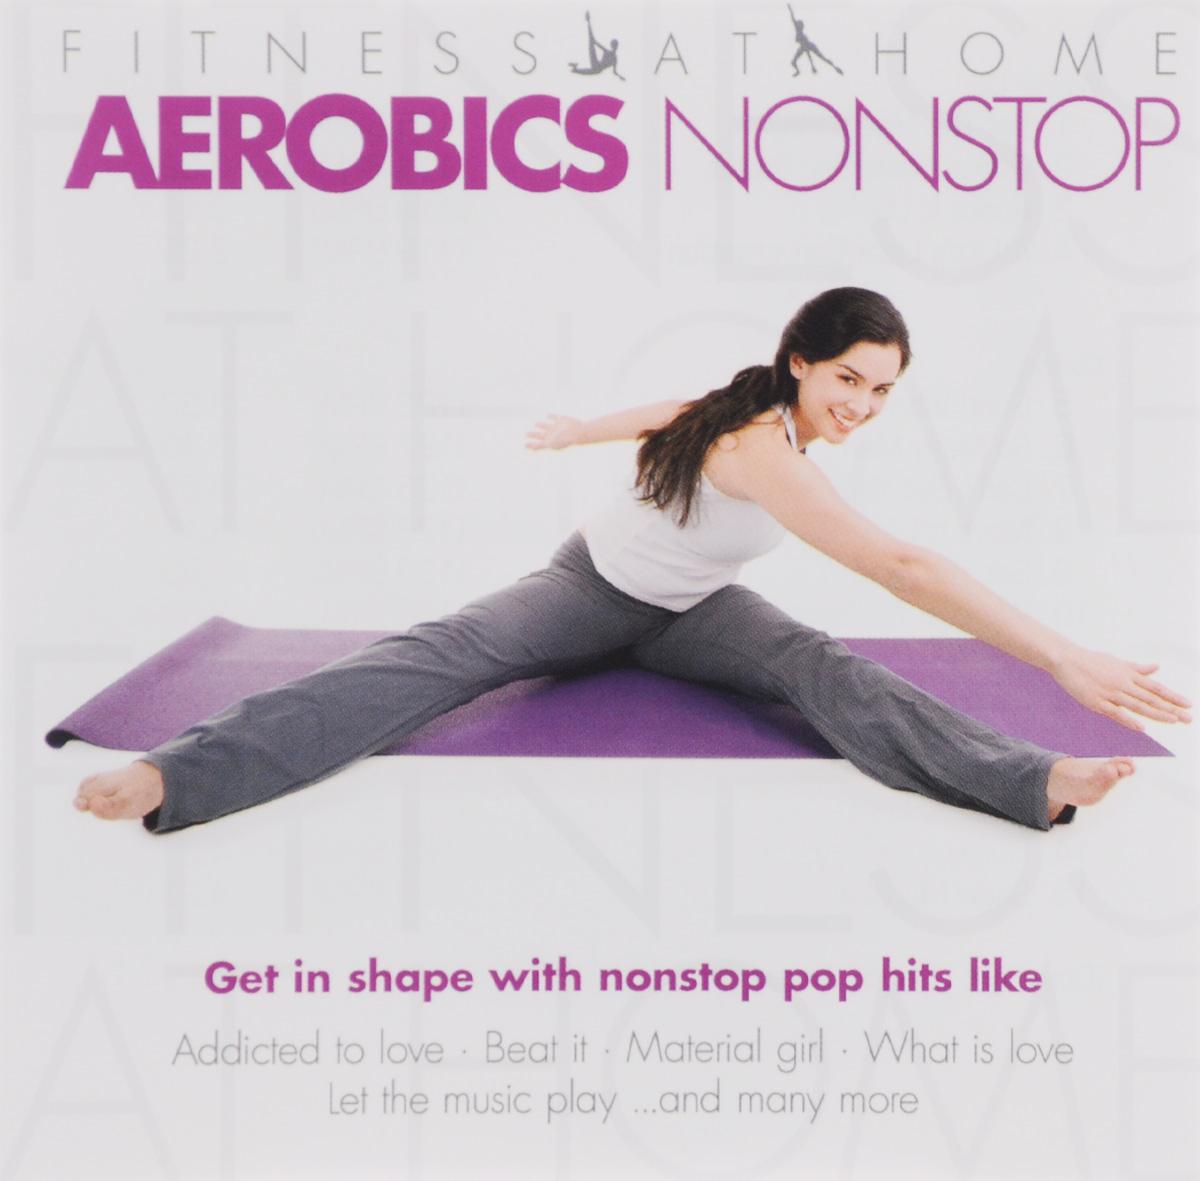 Fitness At Home. Aerobics Nonstop (2 CD)